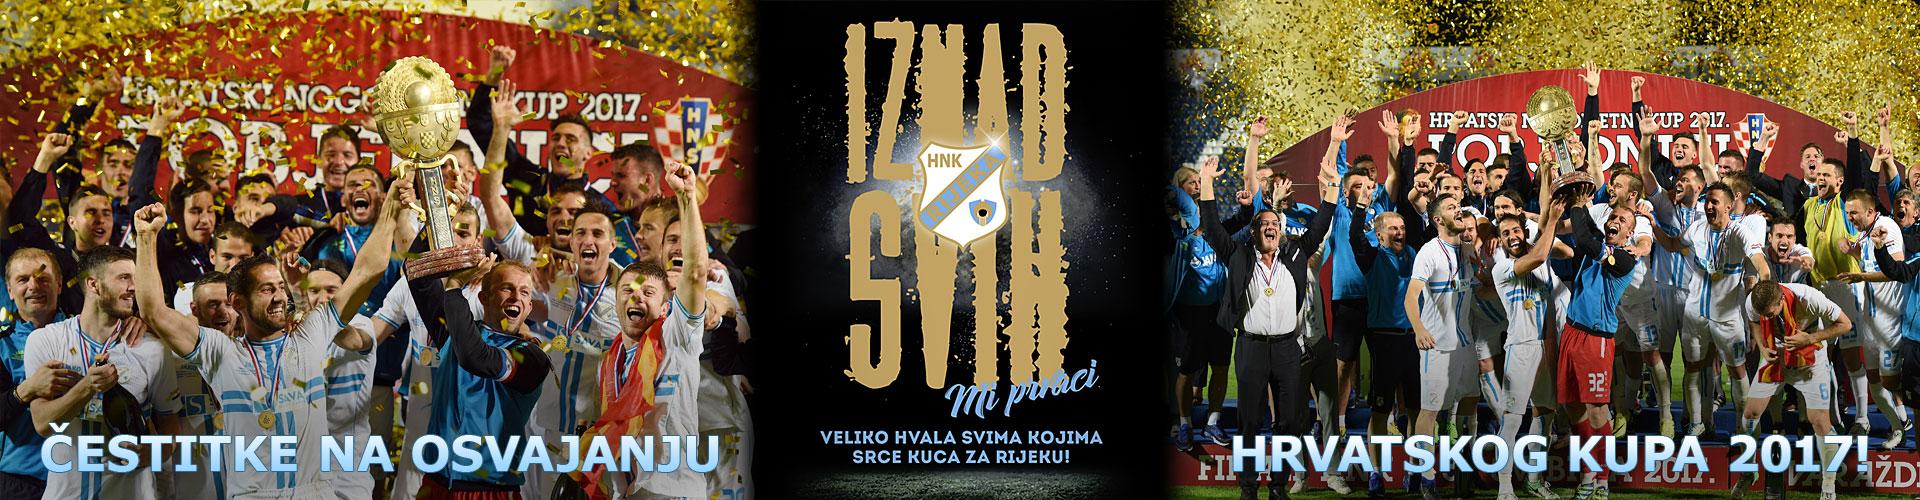 http://www.kimicommerce.hr/Repository/Banners/rijeka-pobjednik-kupa-2017.jpg